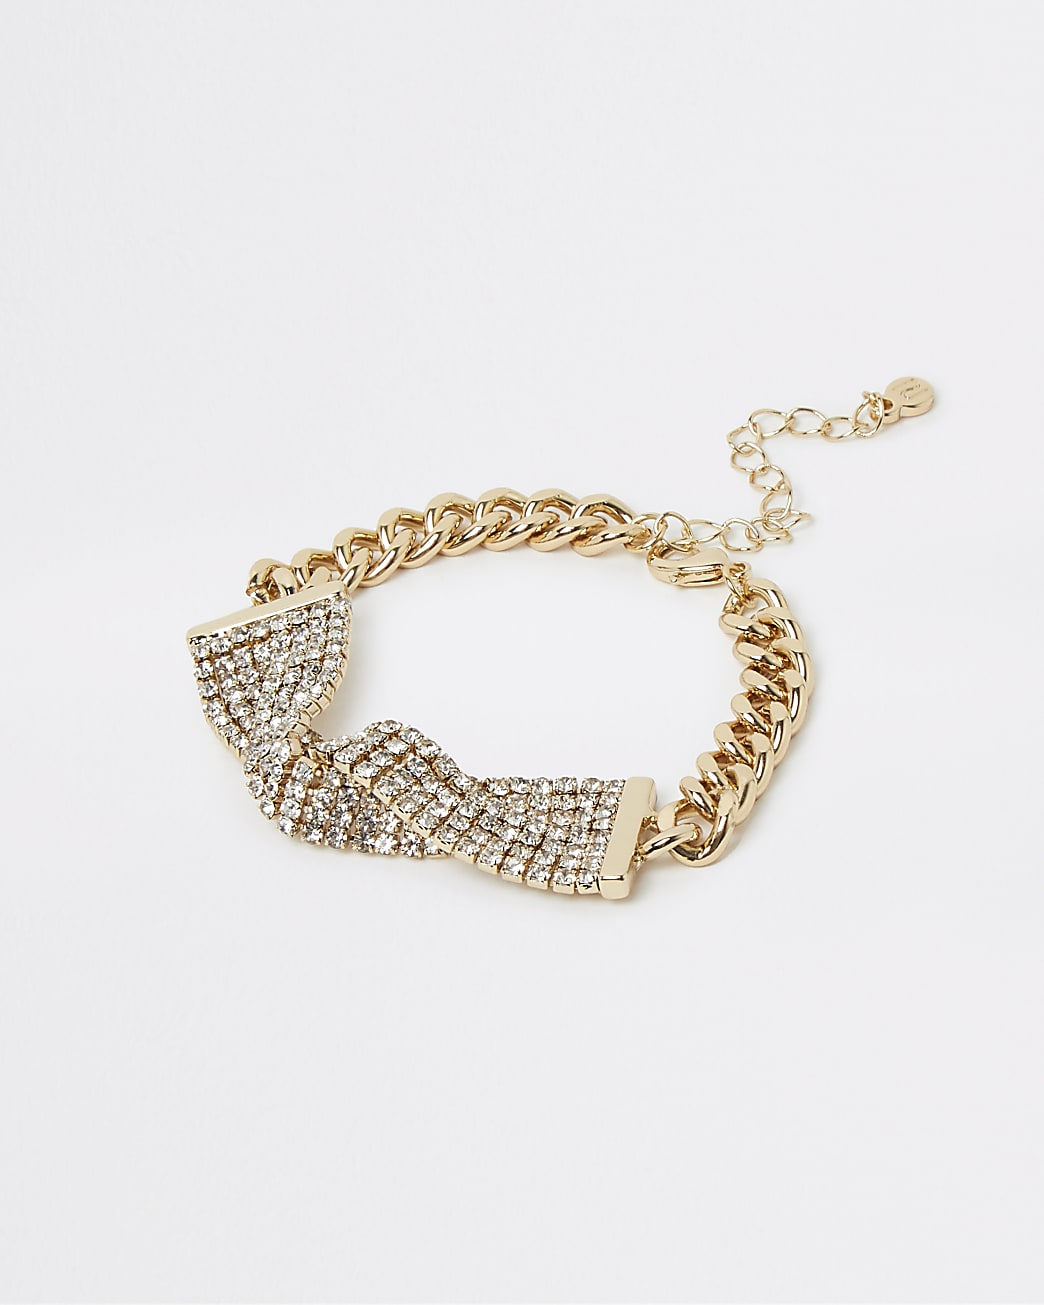 Gold diamante twist chain link bracelet